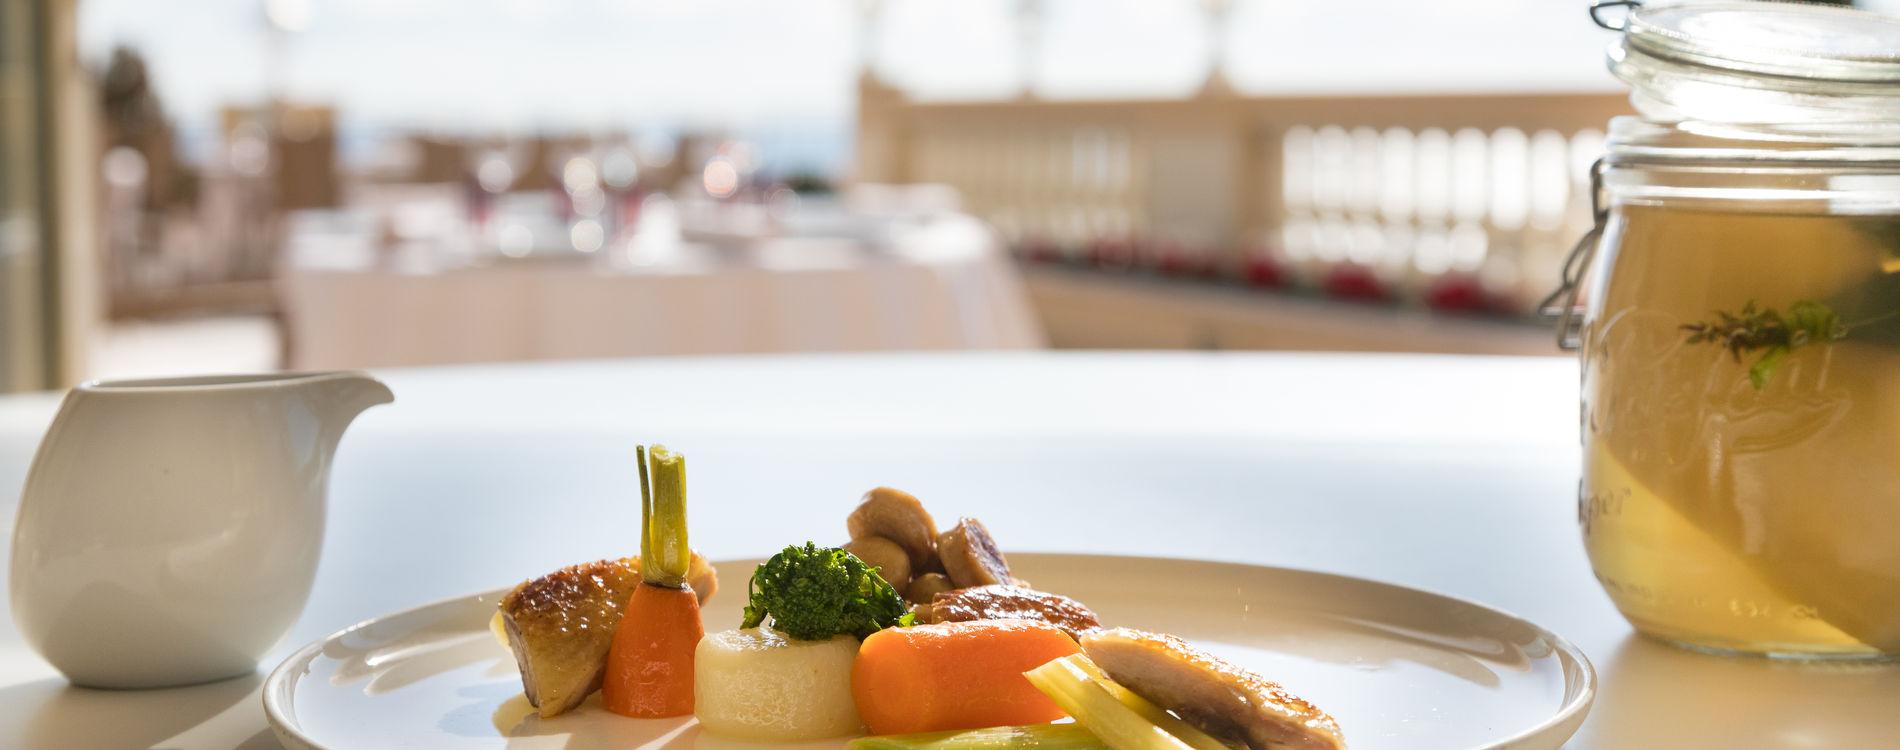 Hôtel Hermitage Monte-Carlo - Restaurant Le Vistamar - Terrasse